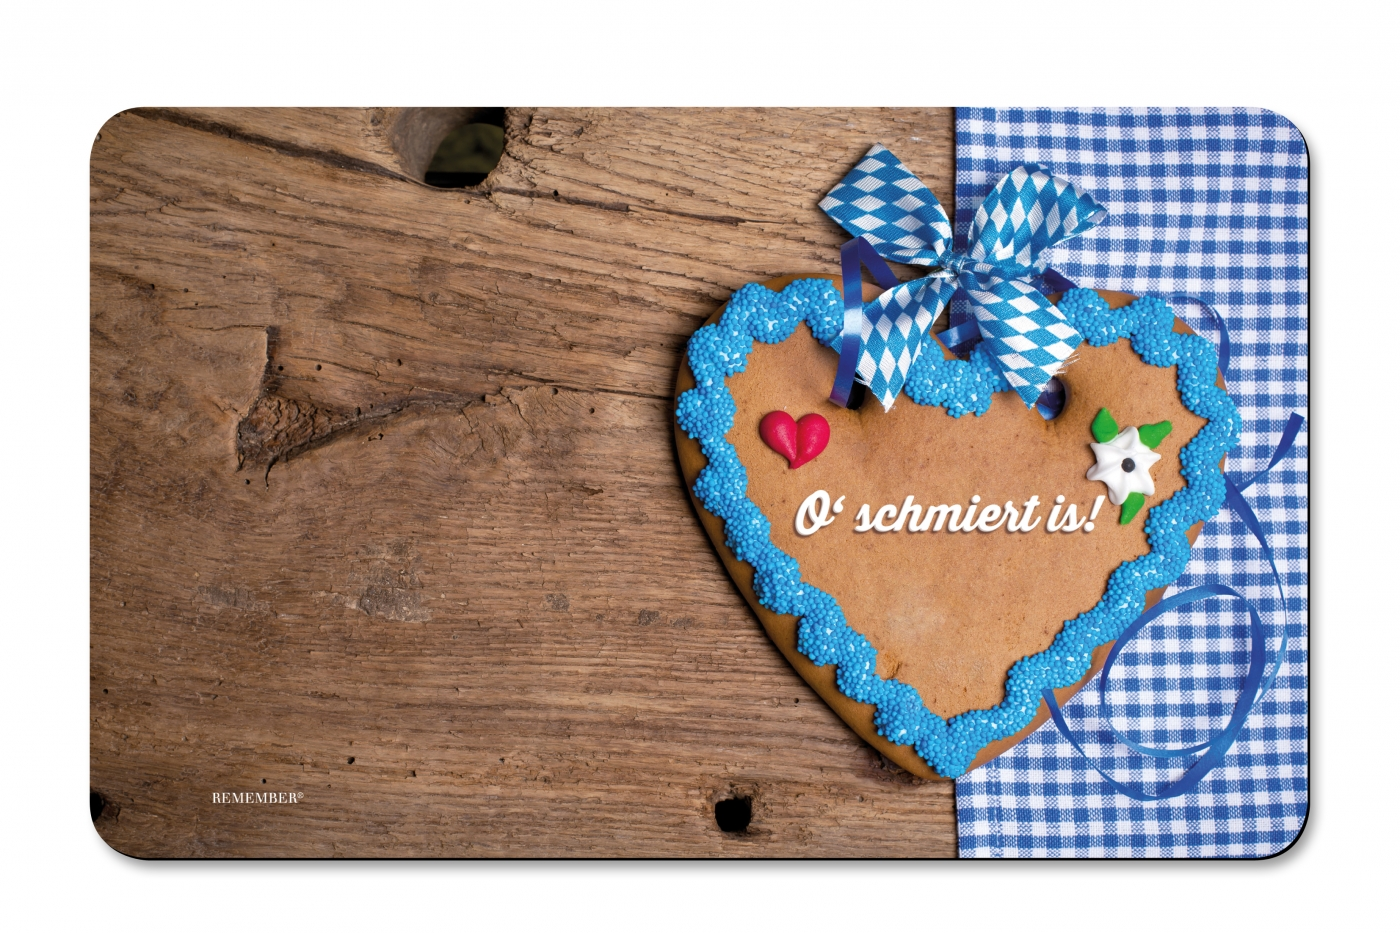 Prkénko umakartové Heart, 24x14 cm, modrá / hnědá